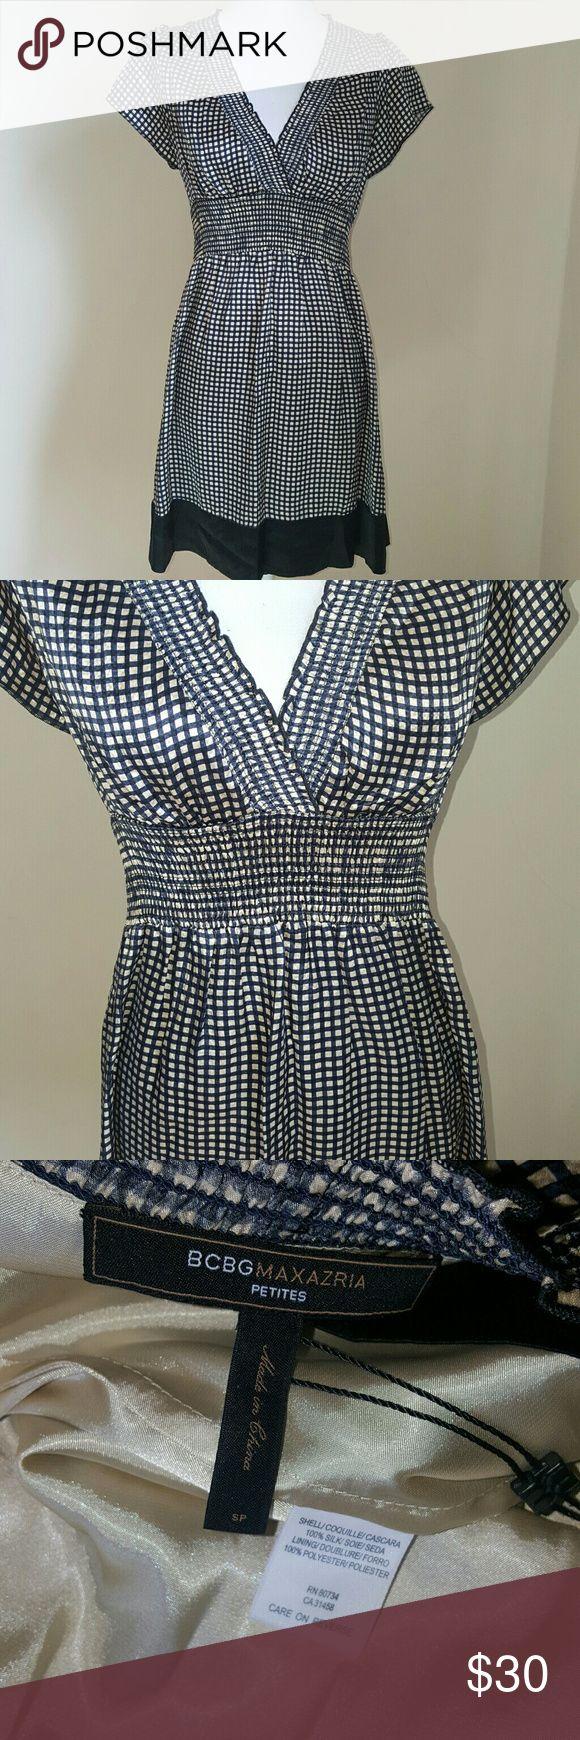 Selling this ⬇️BCBGMaxAzria Silk Checkered Dress on Poshmark! My username is: amichellev. #shopmycloset #poshmark #fashion #shopping #style #forsale #BCBGMaxAzria #Dresses & Skirts